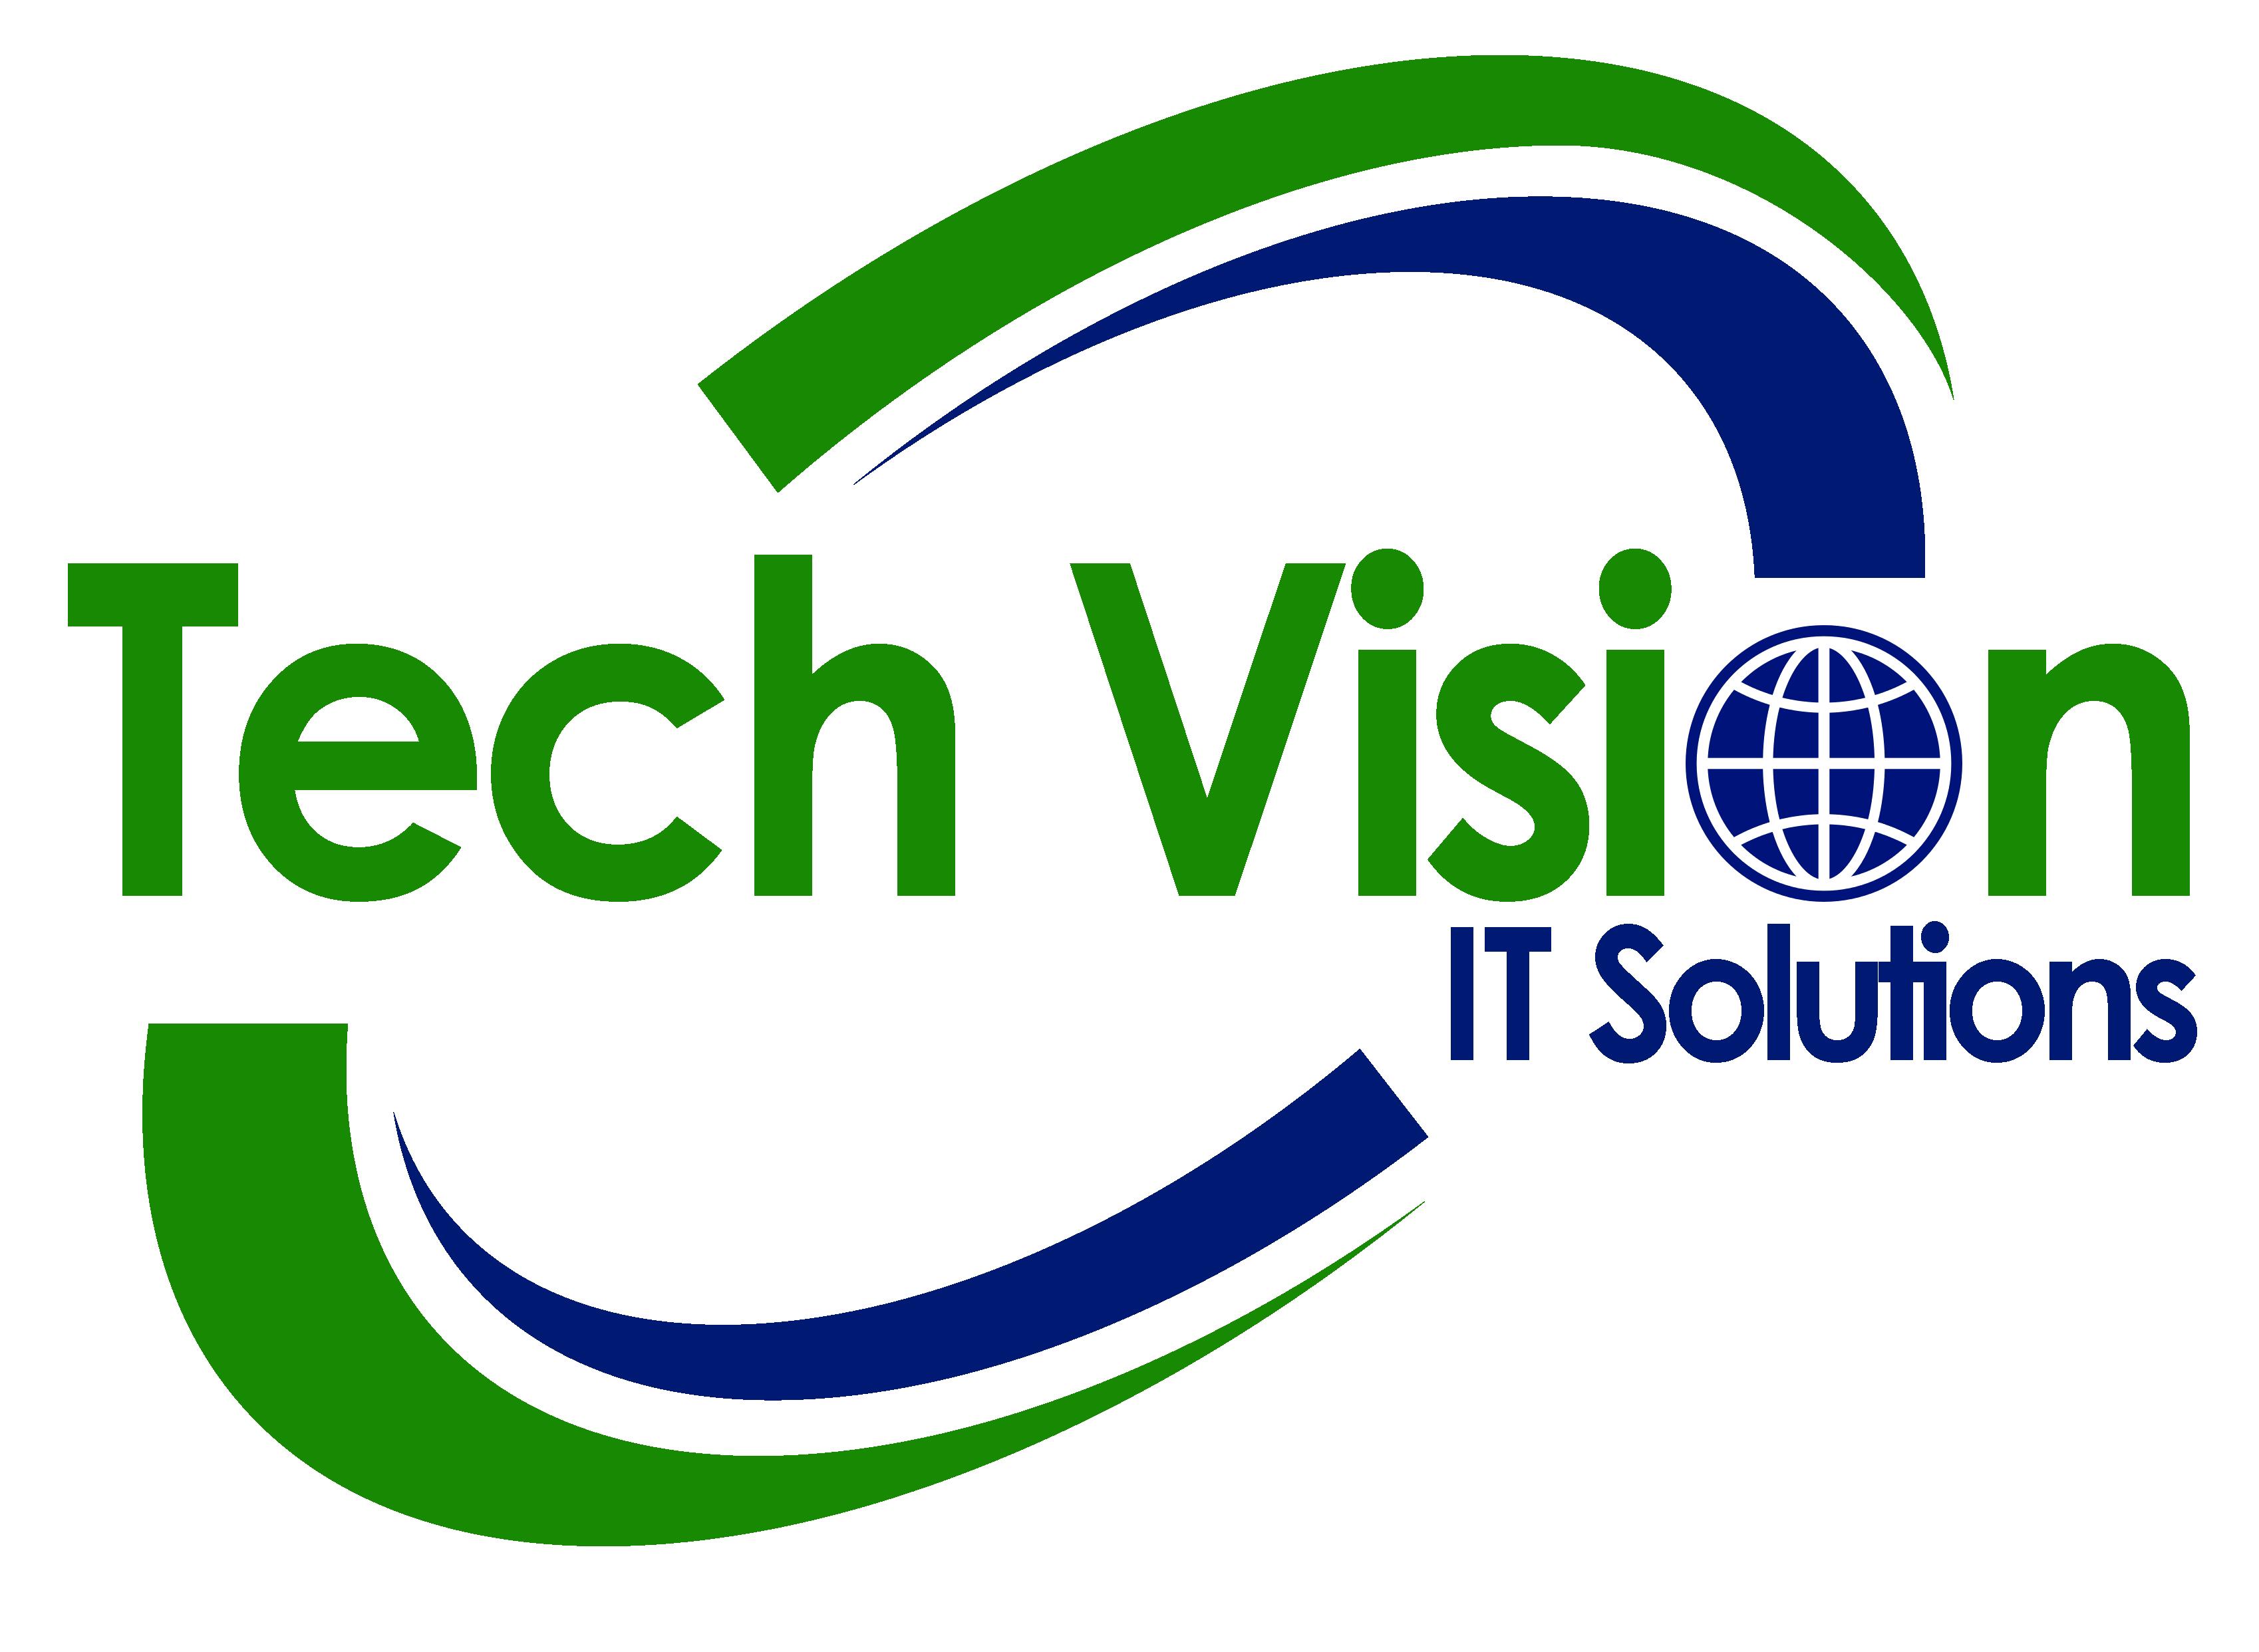 Vision clipart logo. Tech it solutions digital